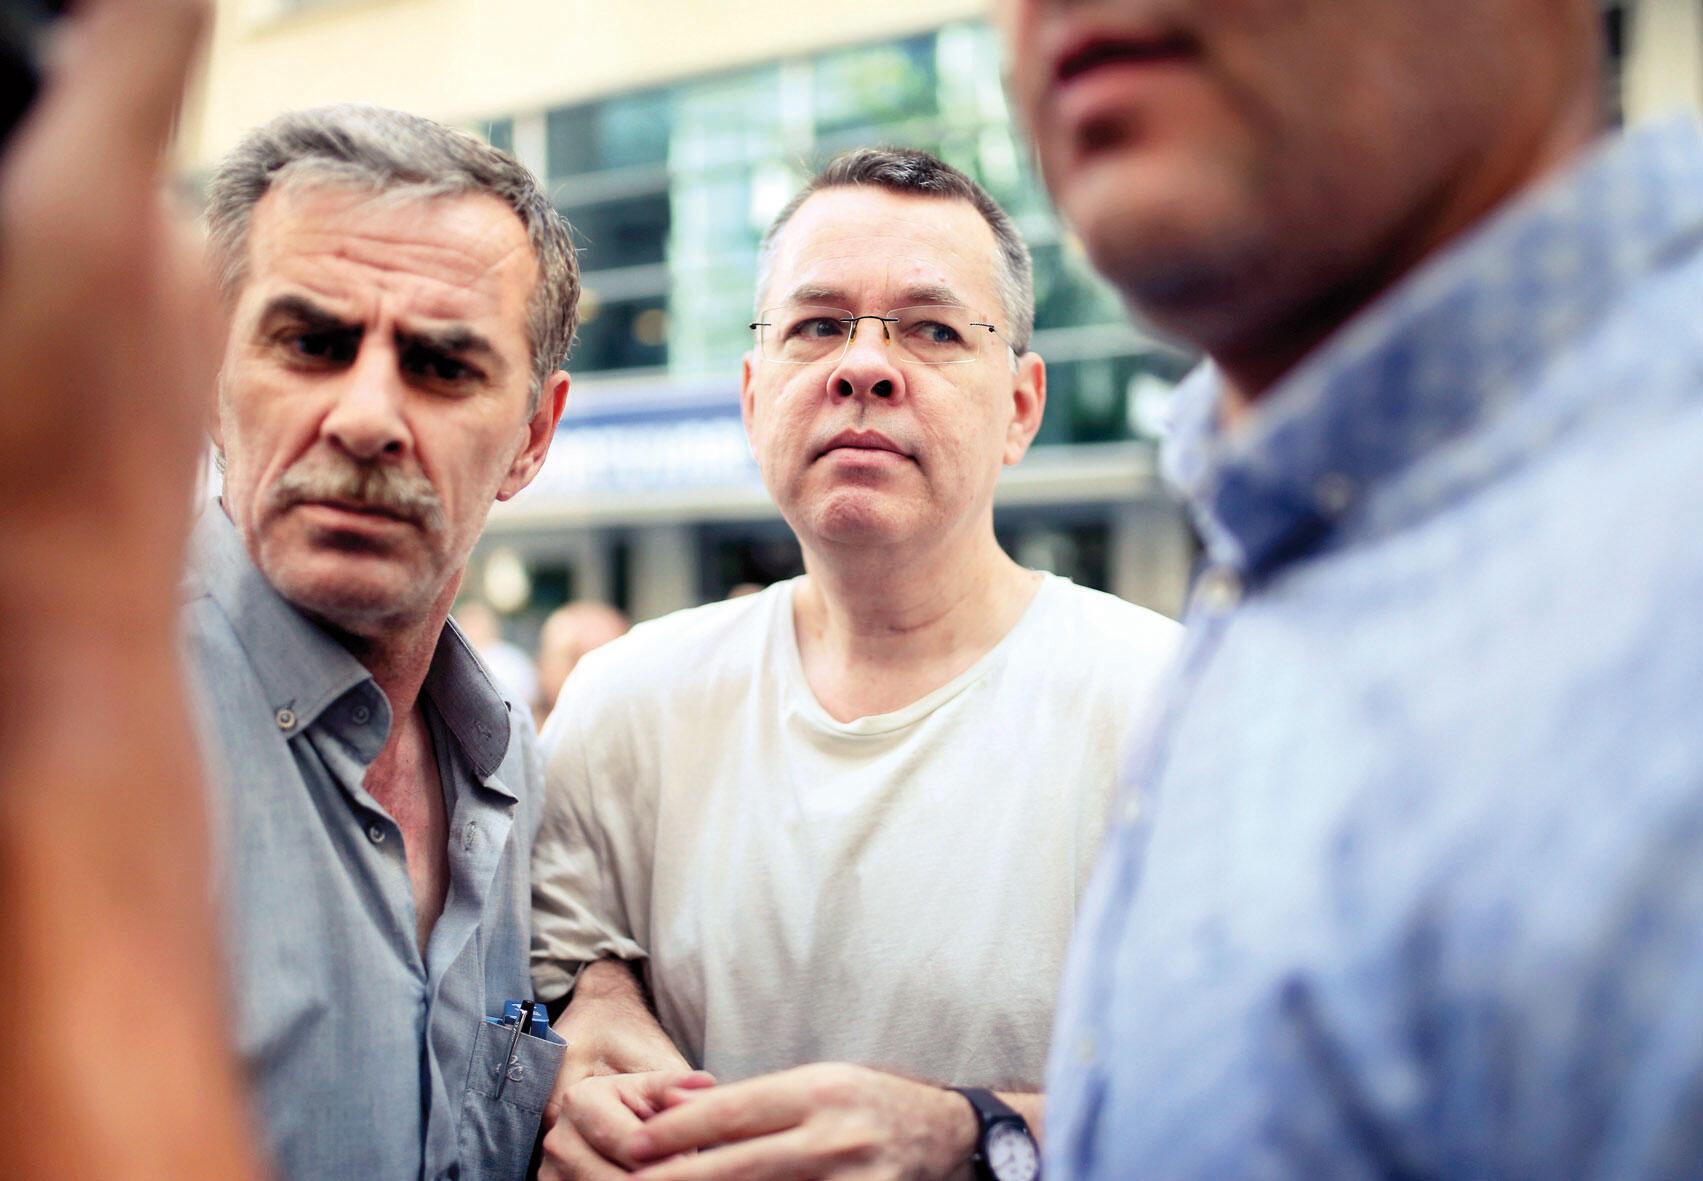 Turkish court rejects U.S. pastor Brunson's appeal for release